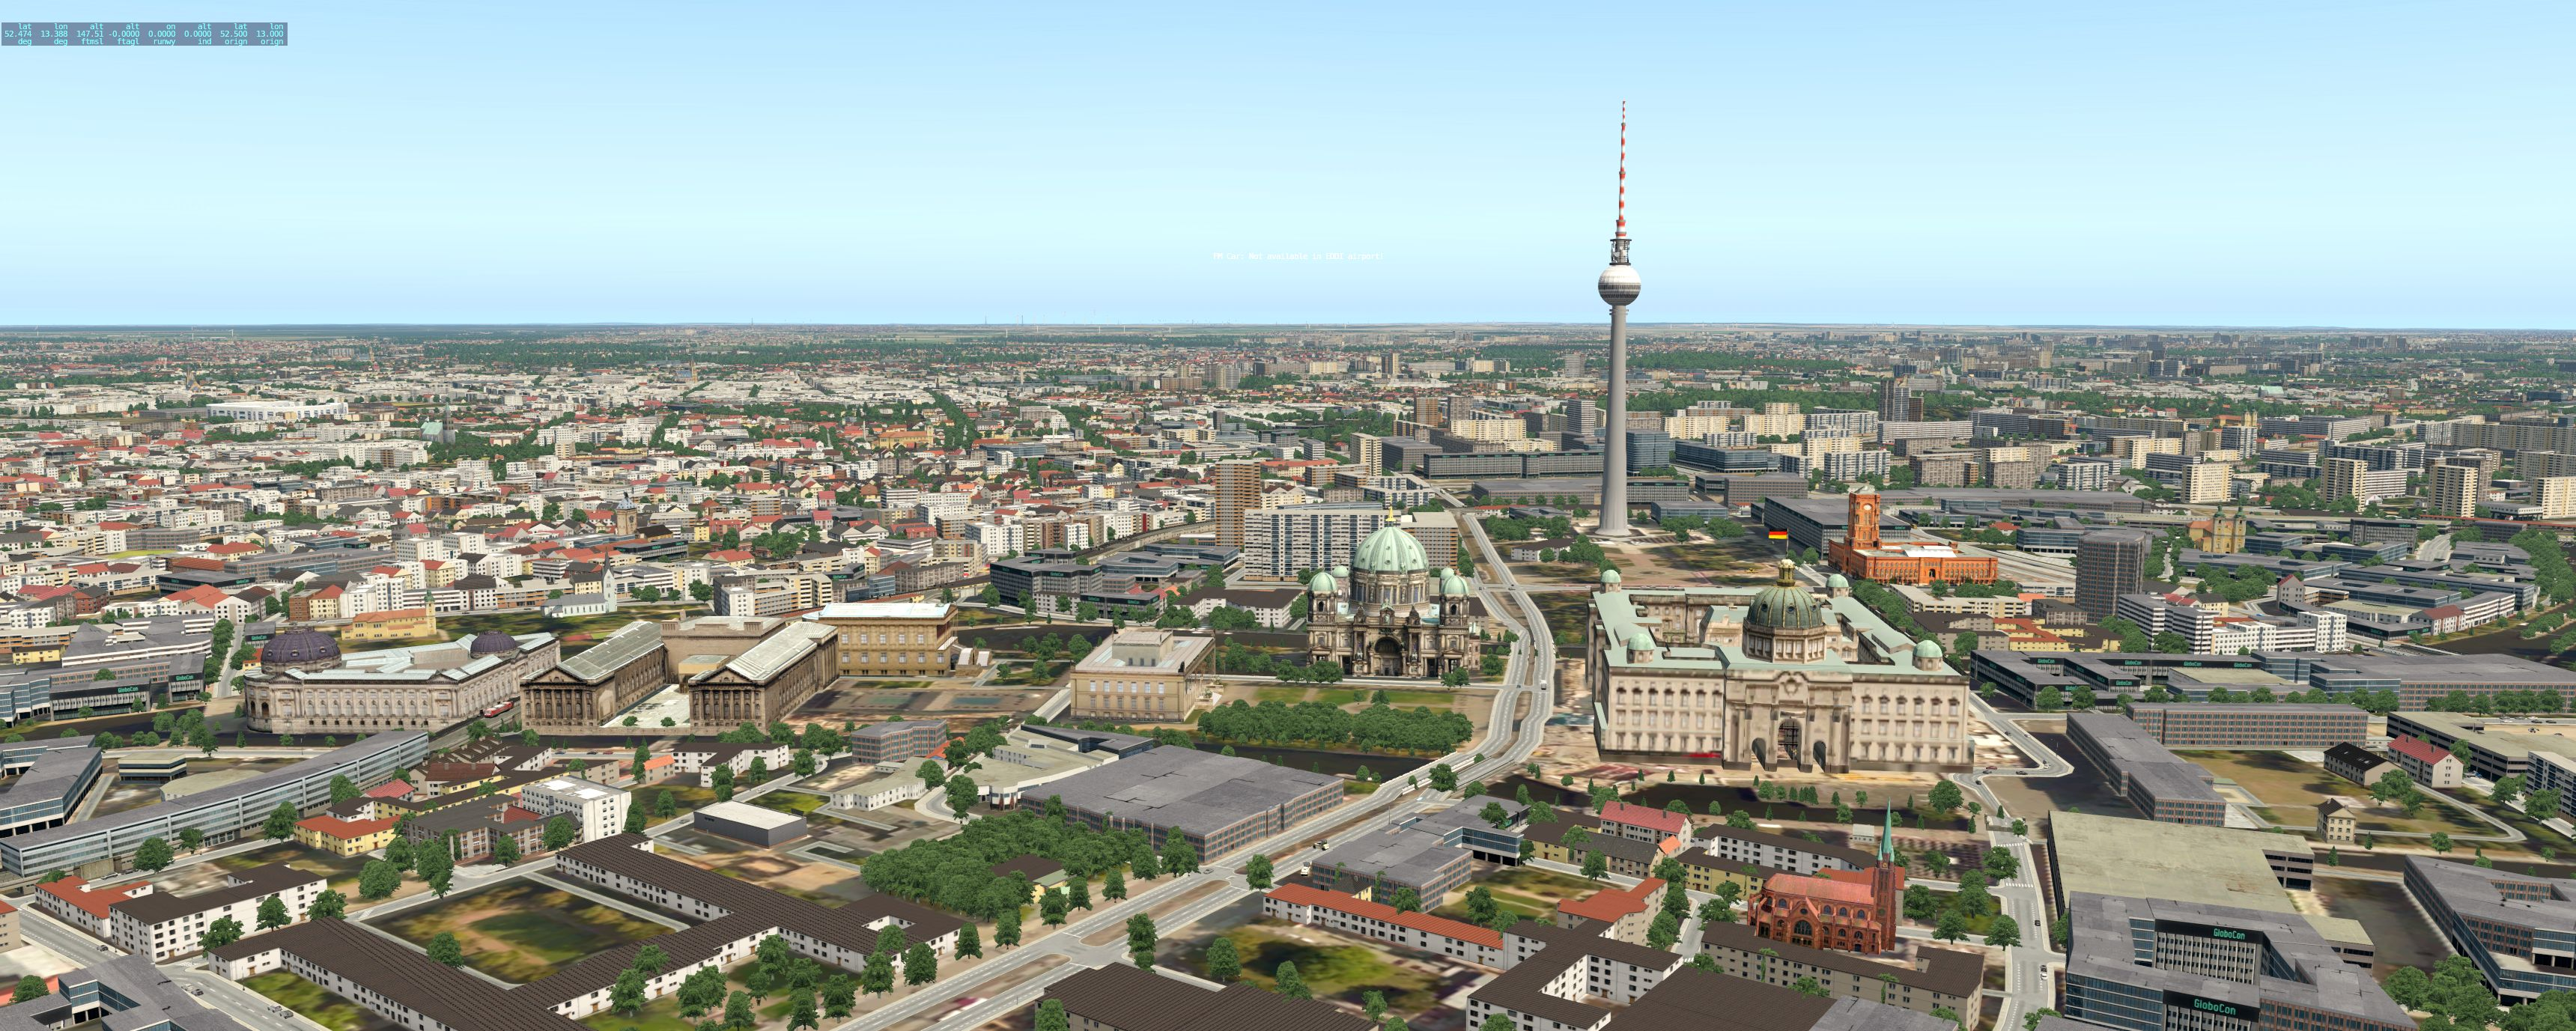 1_X-Europe-3_Berlin1